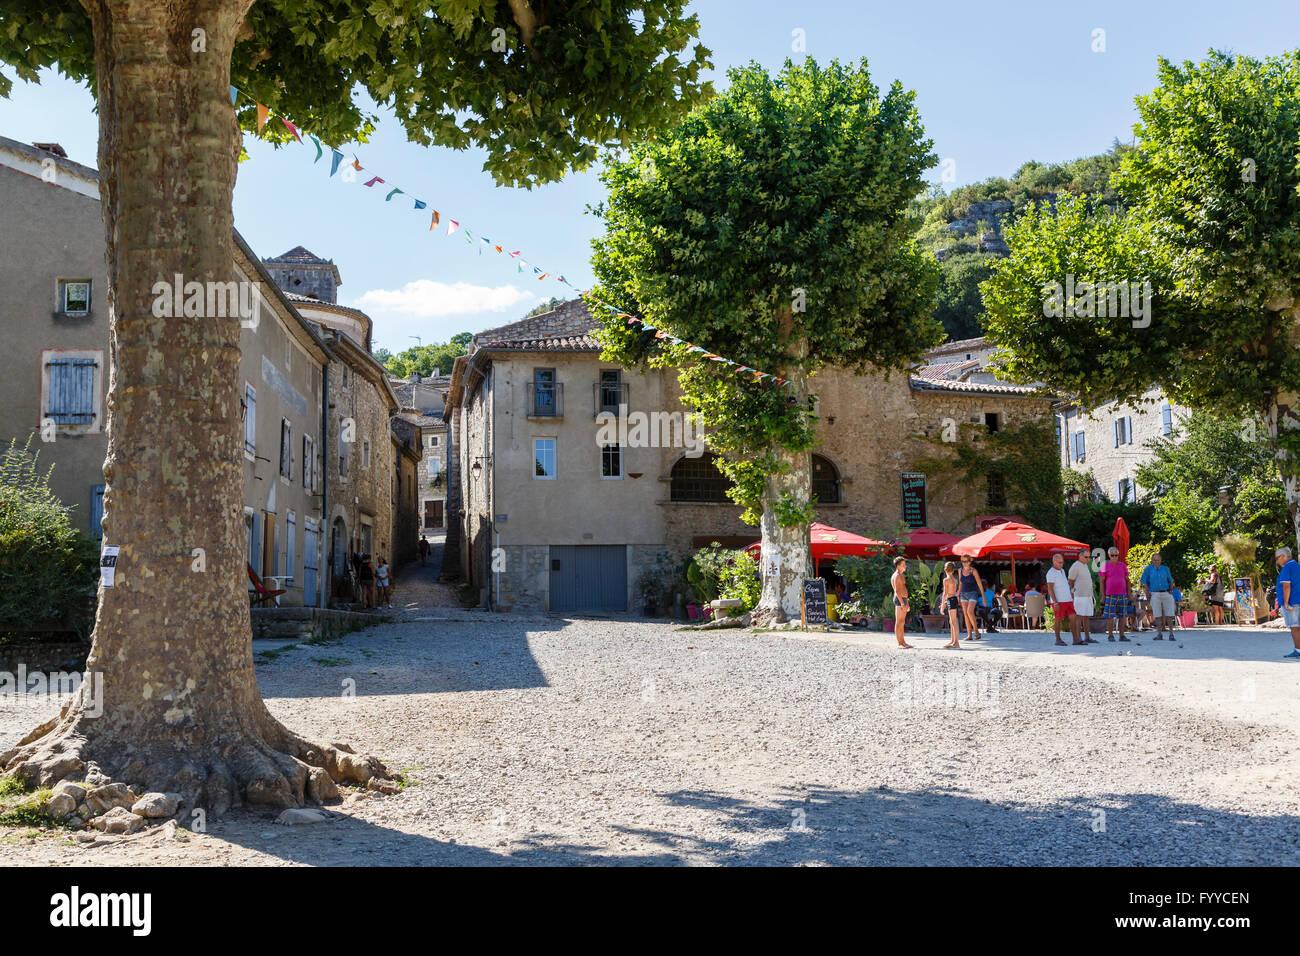 The village square in Labeaume, Ardèche, France - Stock Image